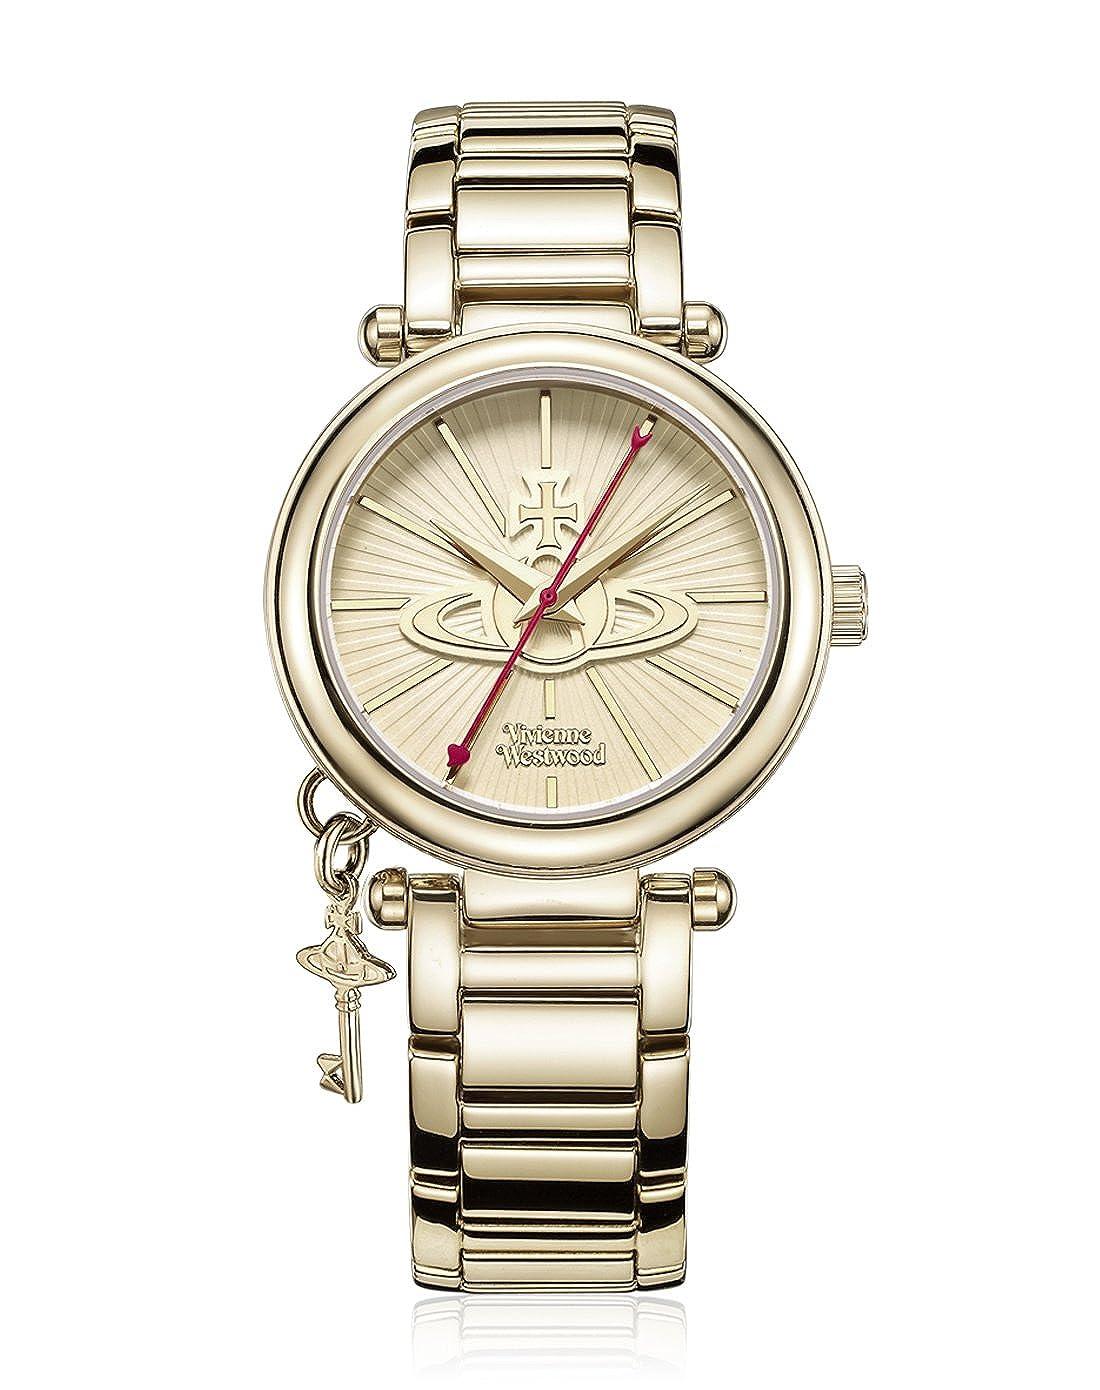 f20421c15d3 Amazon.com: Vivienne Westwood Women's VV006KGD Kensington II Analog Display  Swiss Quartz Gold Watch: Watches